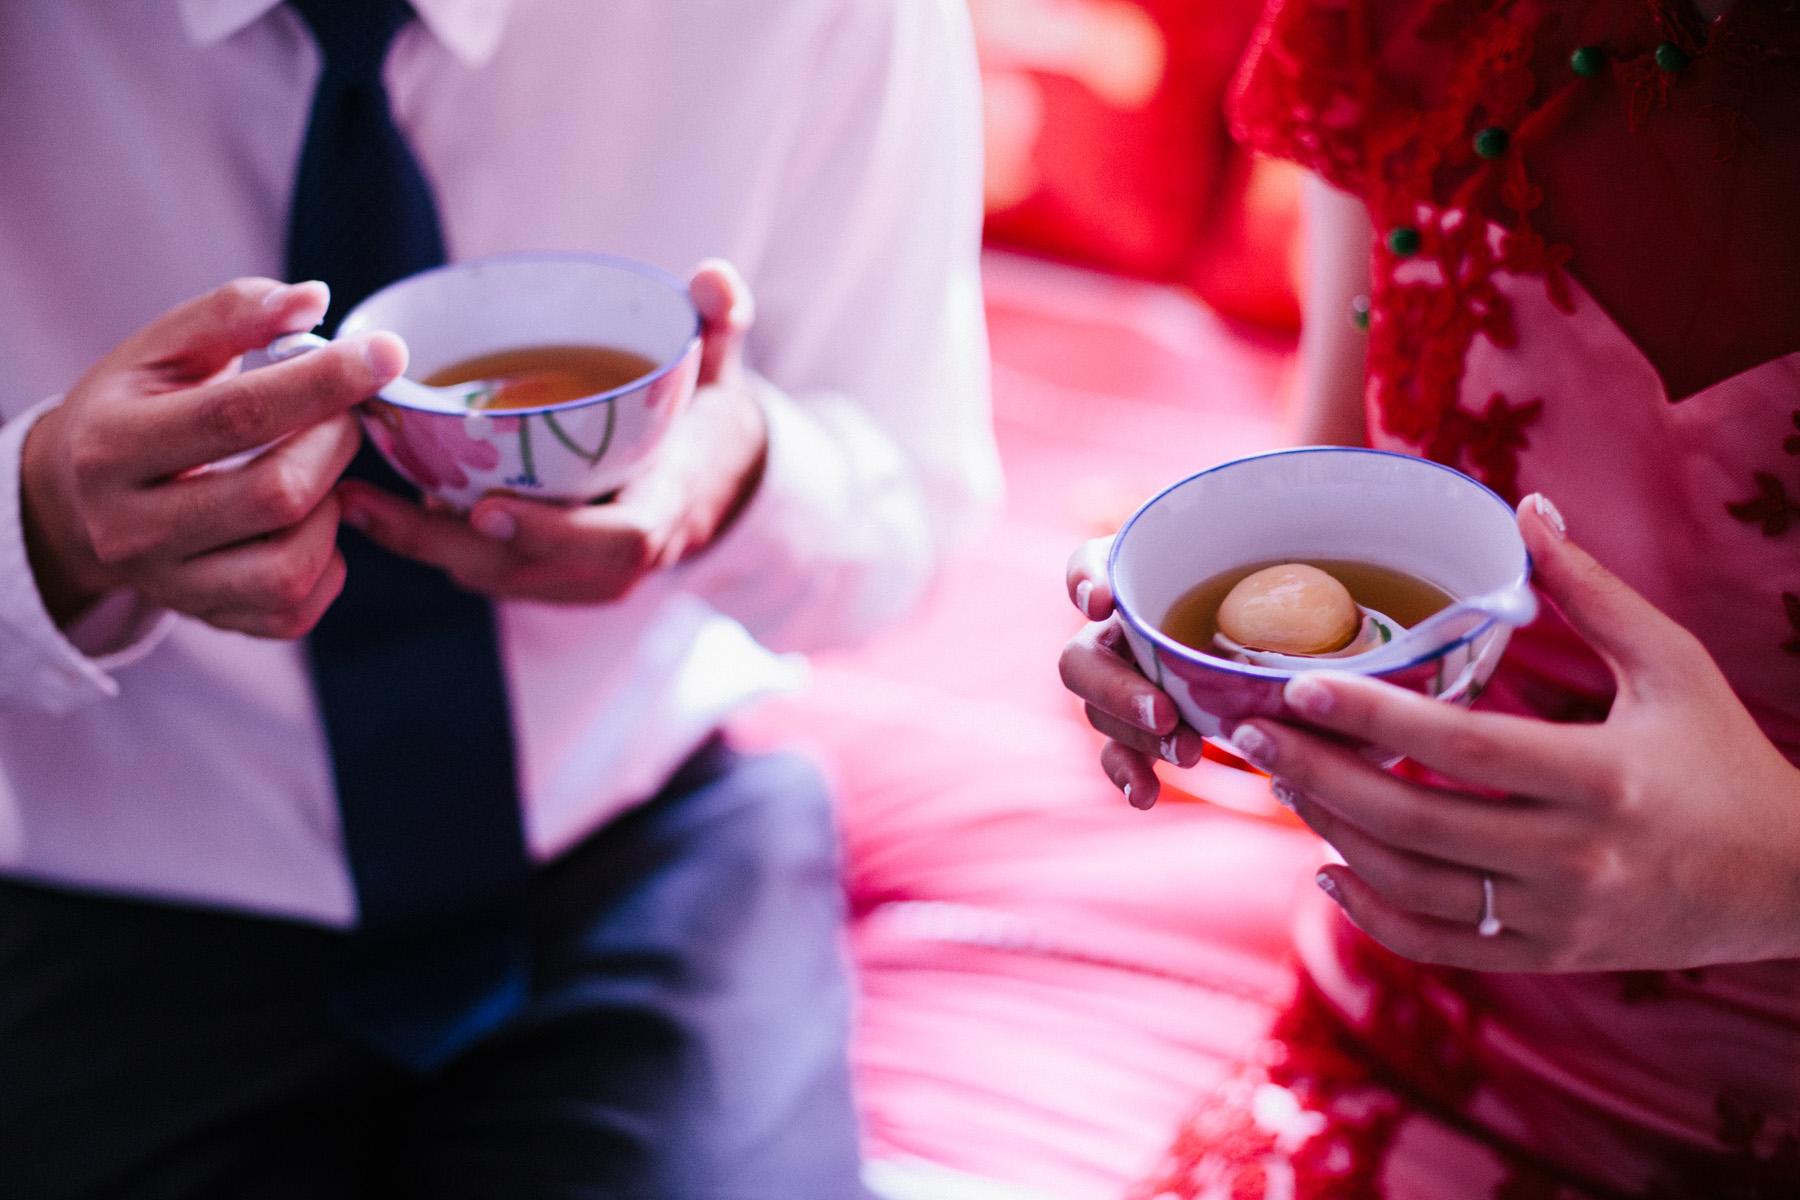 singapore-wedding-travel-photographer-faith-alvin-wedding-wmt-19.jpg